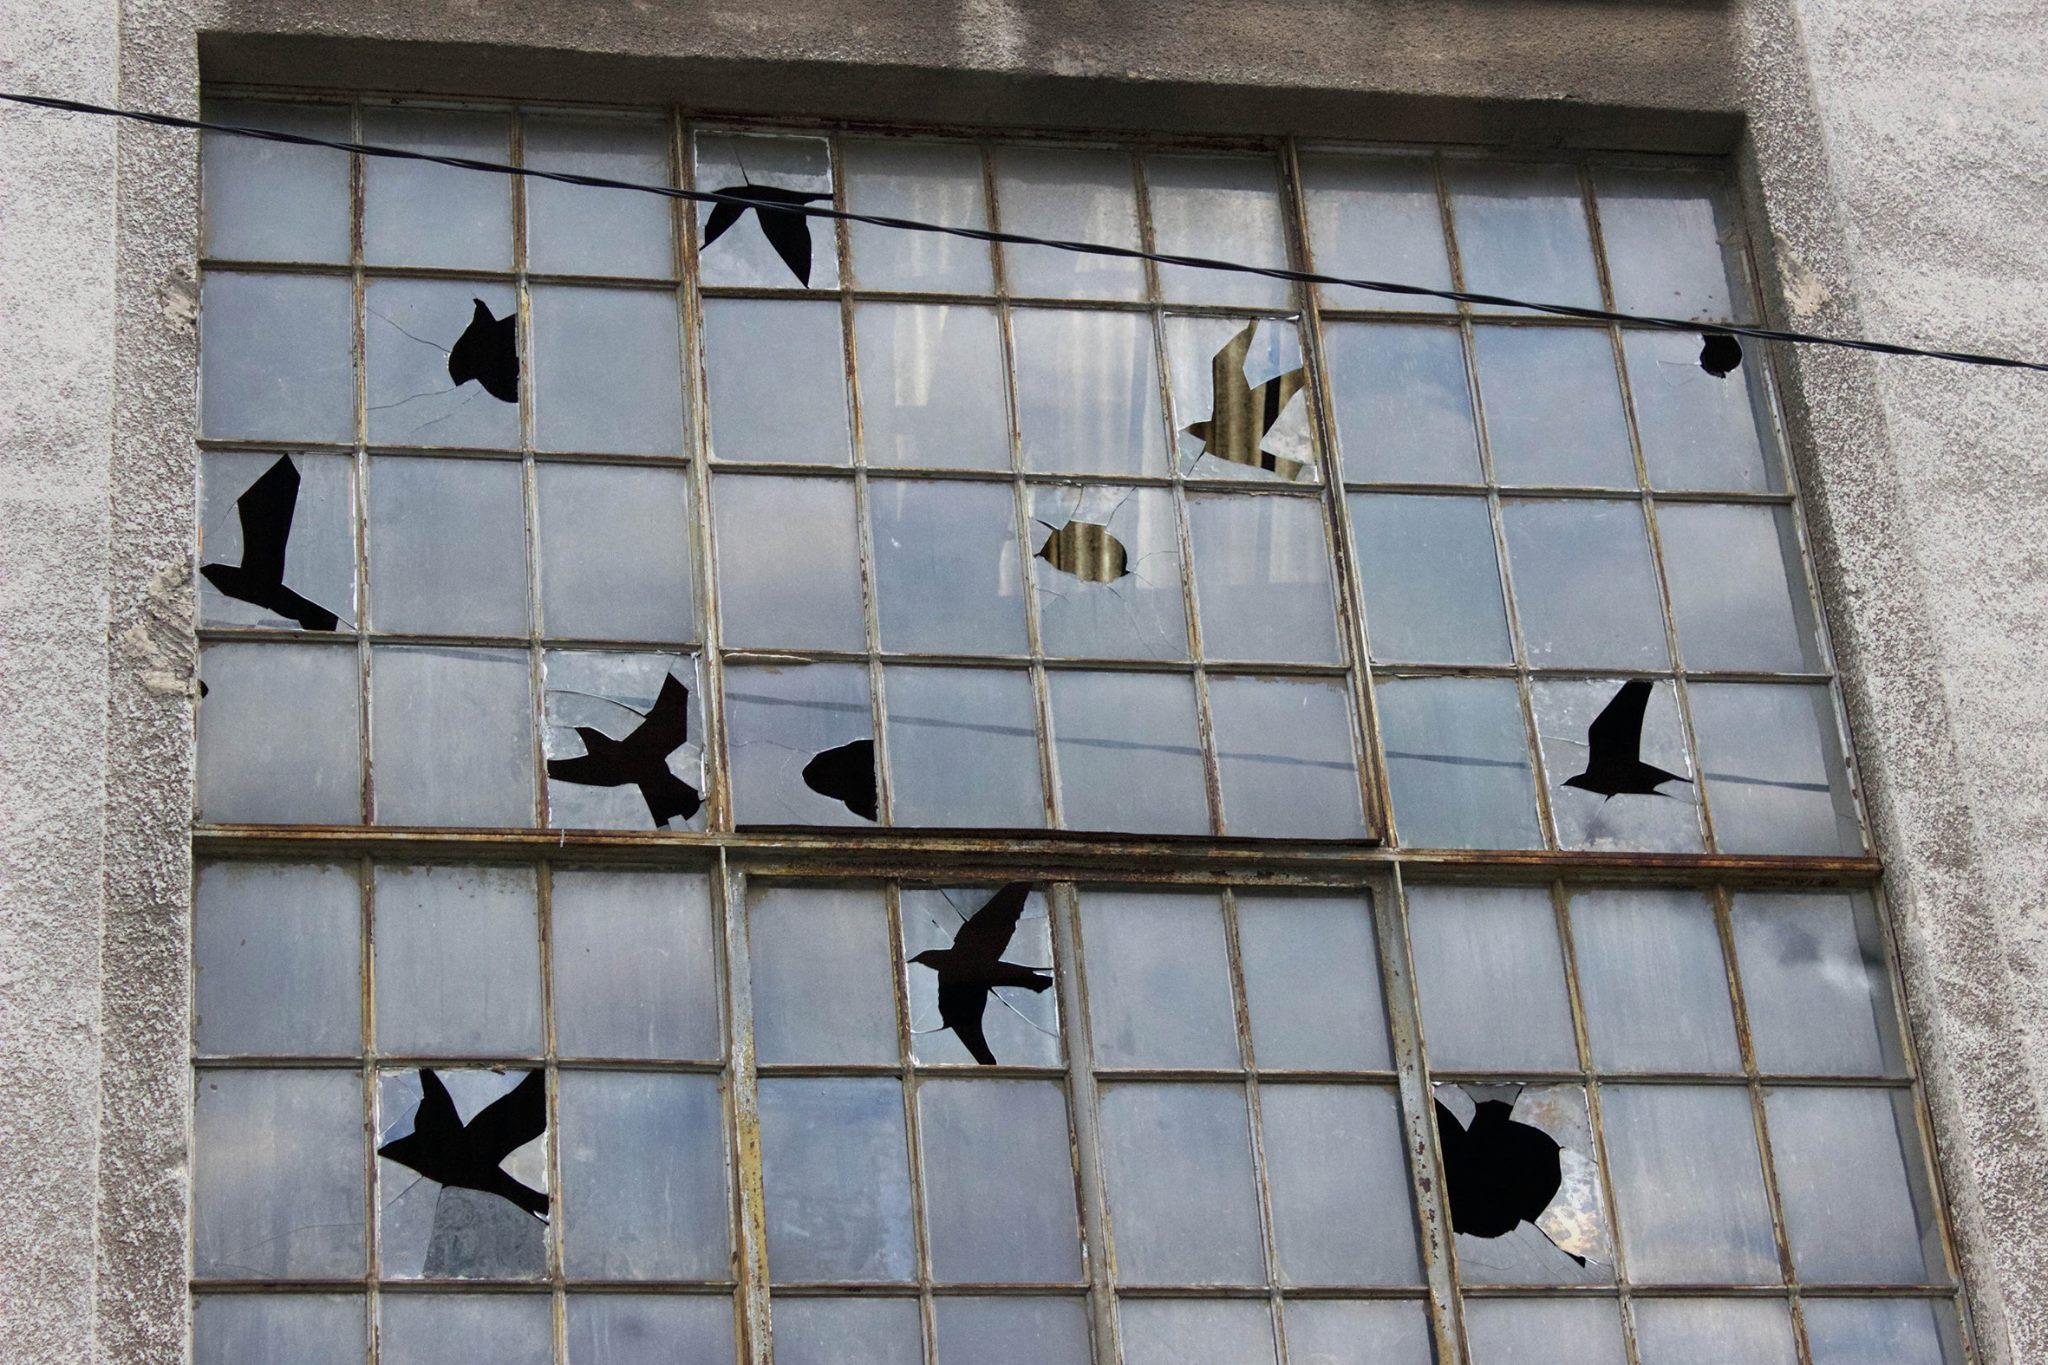 Street Art by Pejac in Croatia, Rijeka - 'Camouflage' Tribute to René Magritte 1